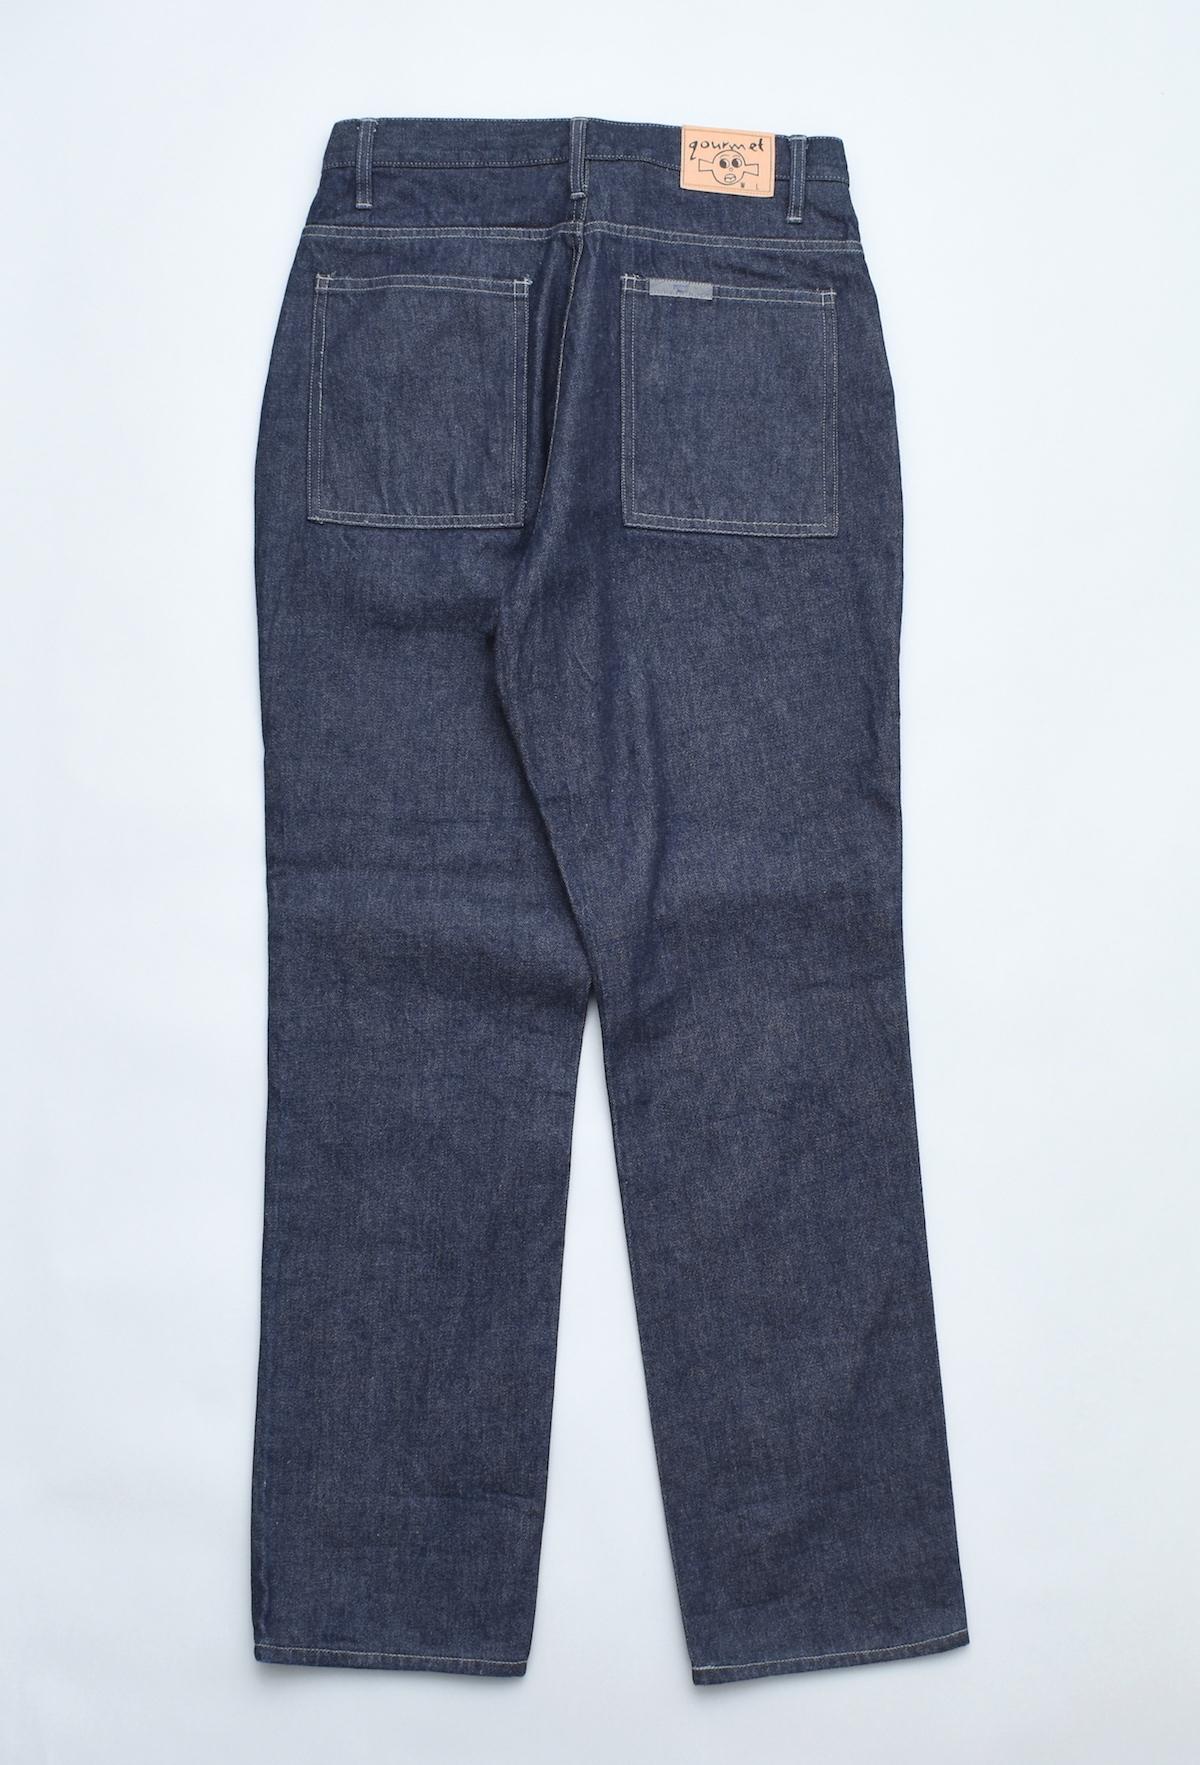 gourmet jeans「TYPE 03 - HIP!!  /  INDIGO」